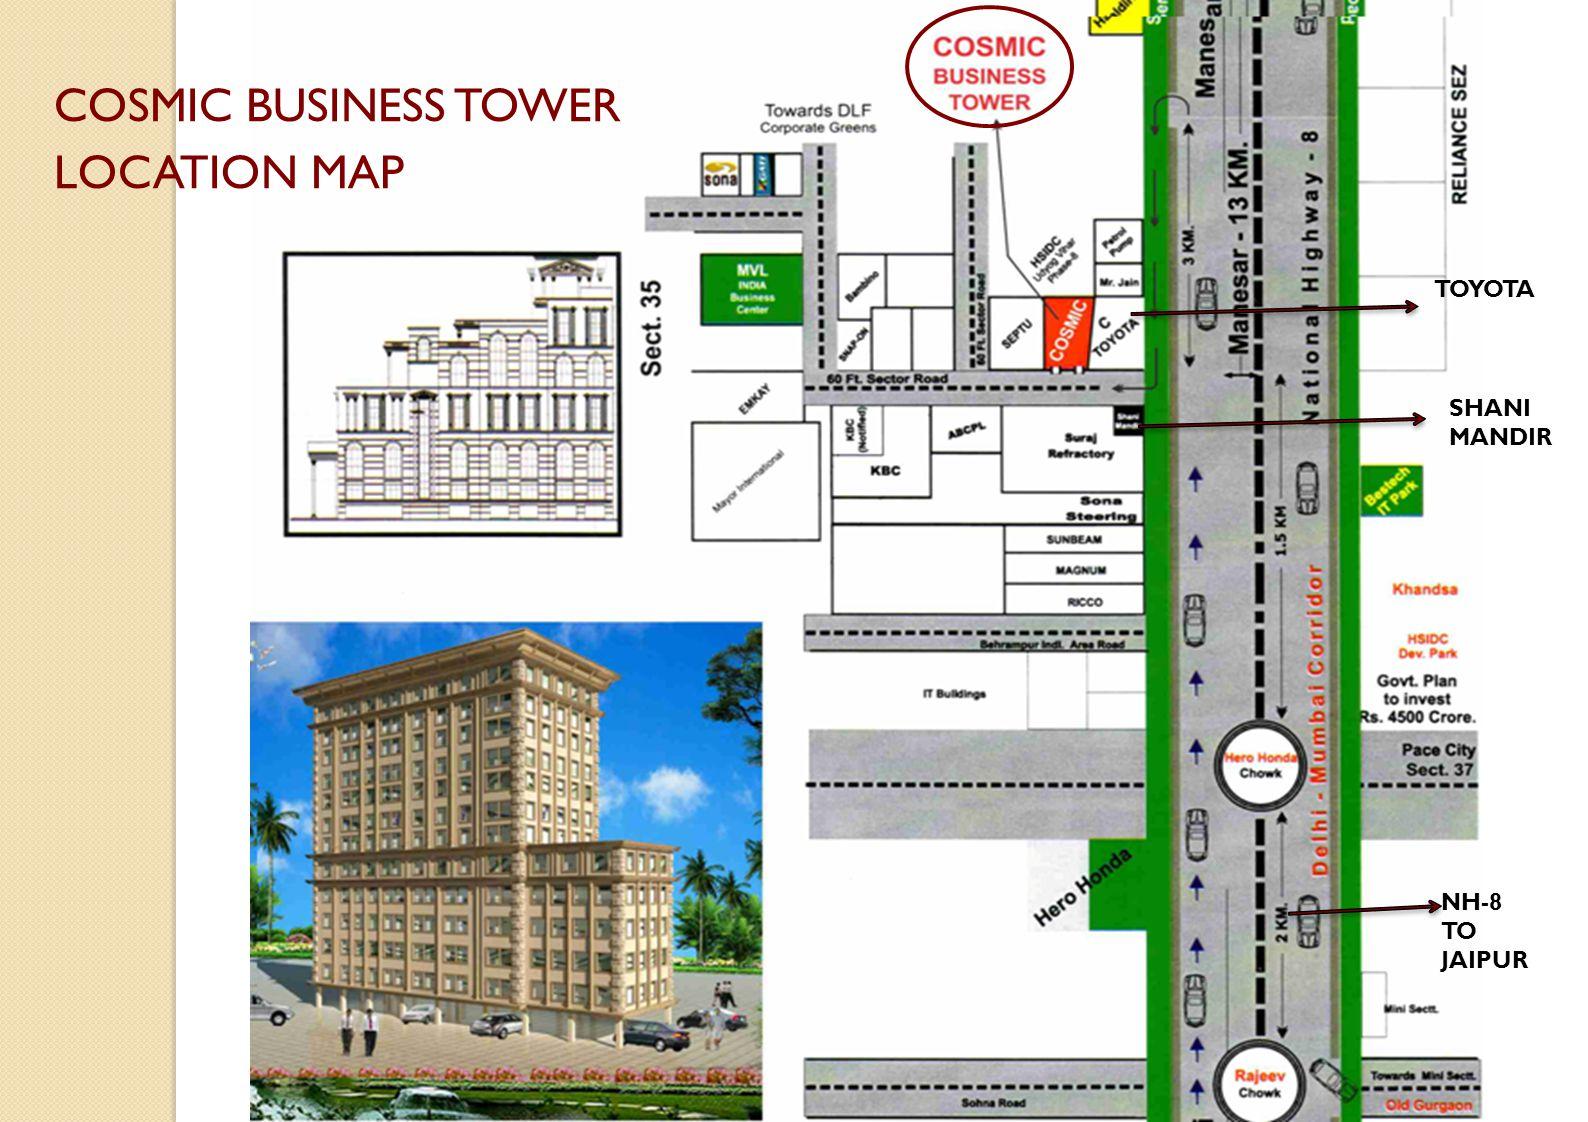 SHANI MANDIR TOYOTA NH-8 TO JAIPUR COSMIC BUSINESS TOWER LOCATION MAP